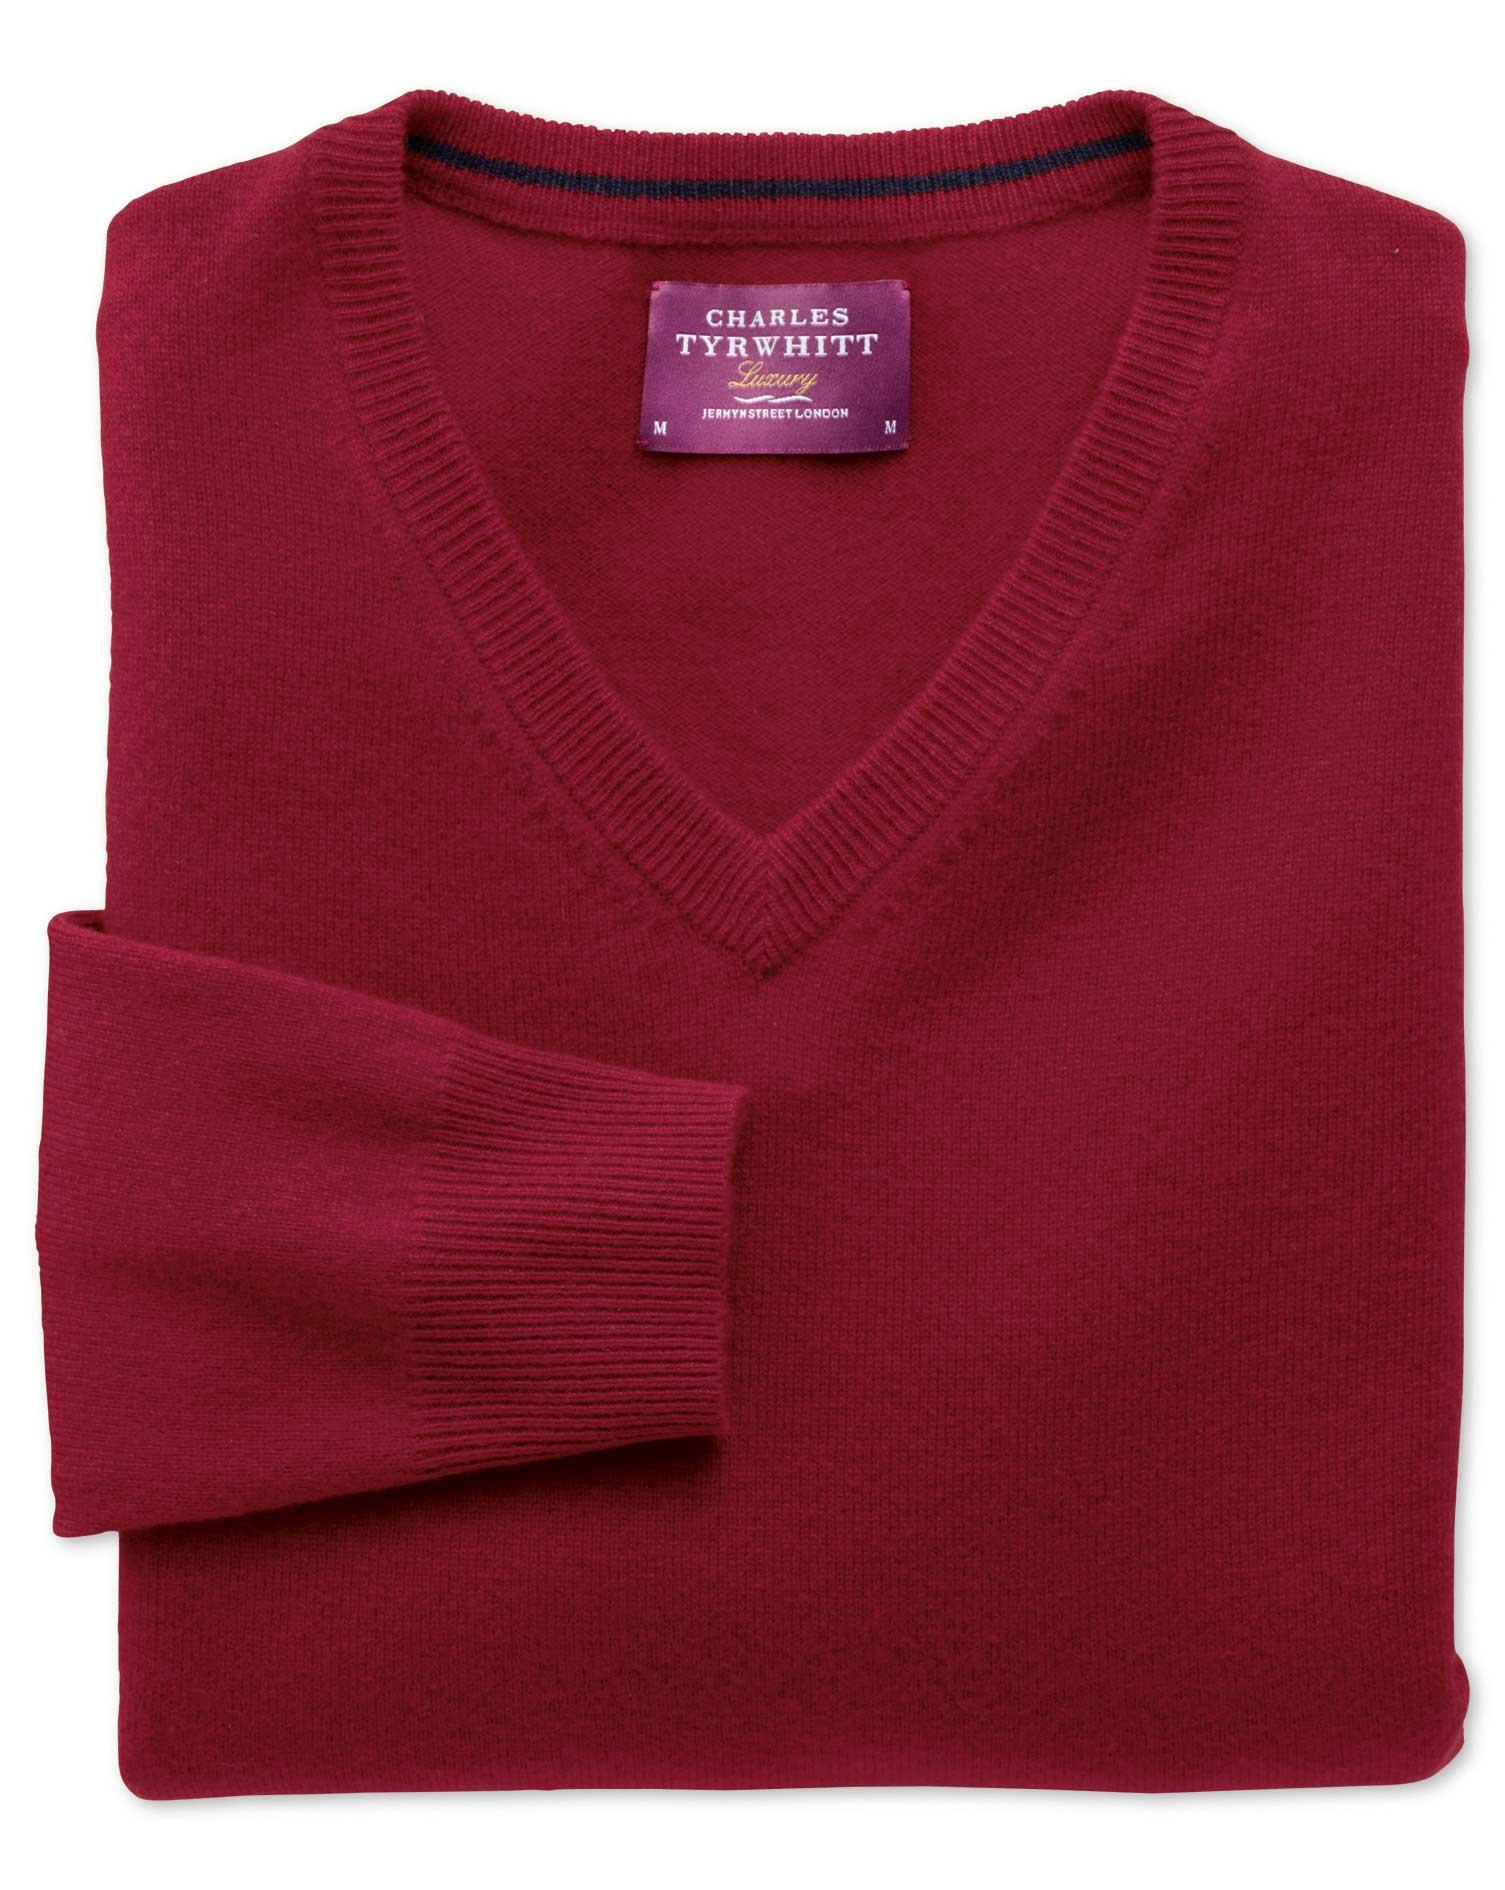 Red Cashmere V-Neck Jumper Size XS by Charles Tyrwhitt